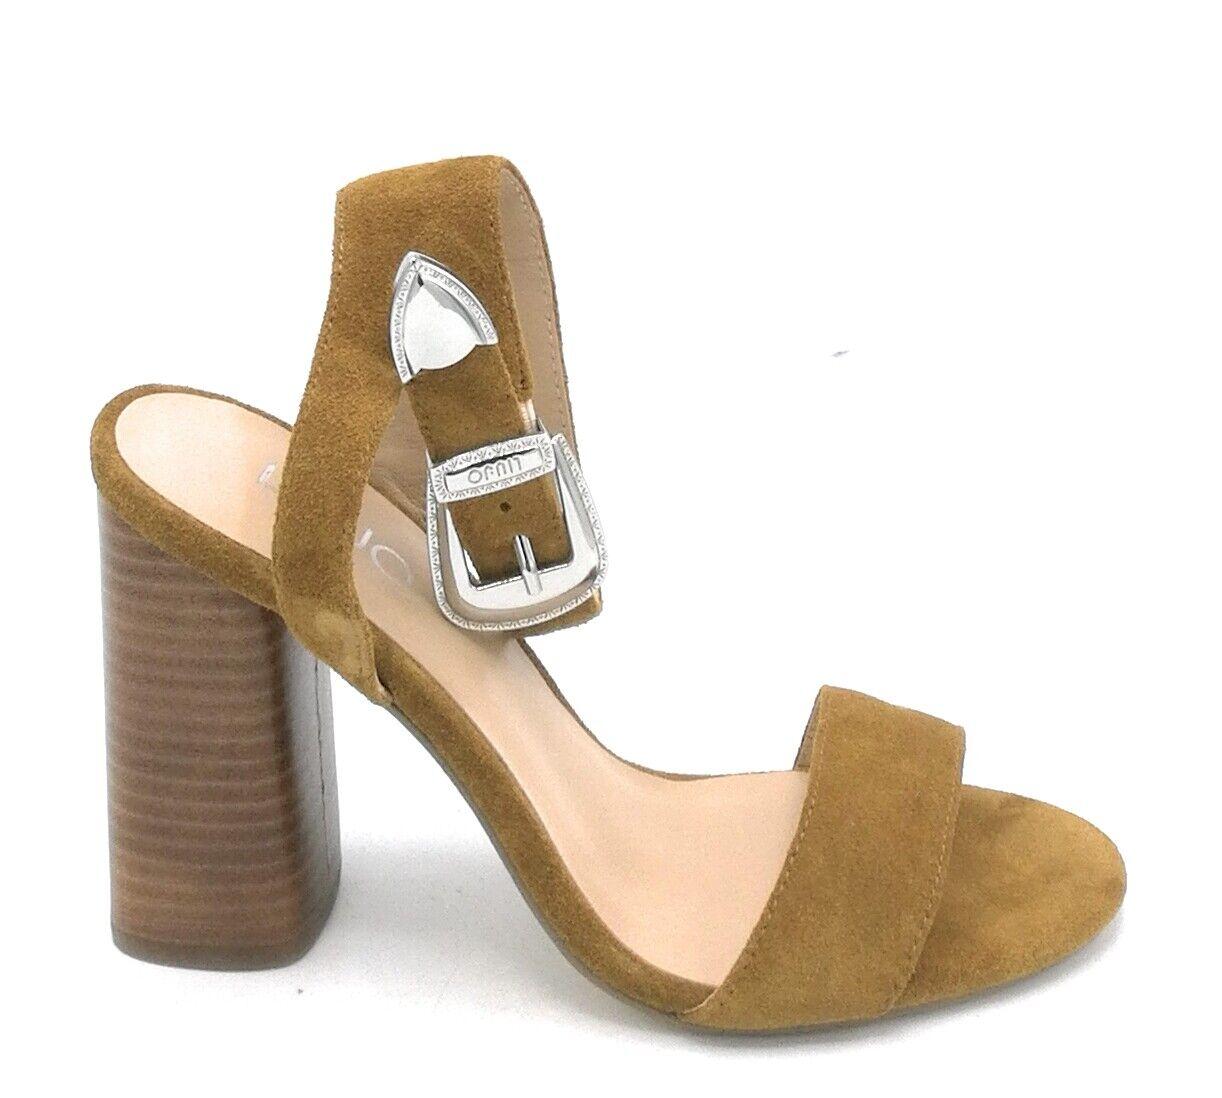 Liu Jo S19101 sandalo camoscio cammello cinturino fibbia tacco quadro 9 cm